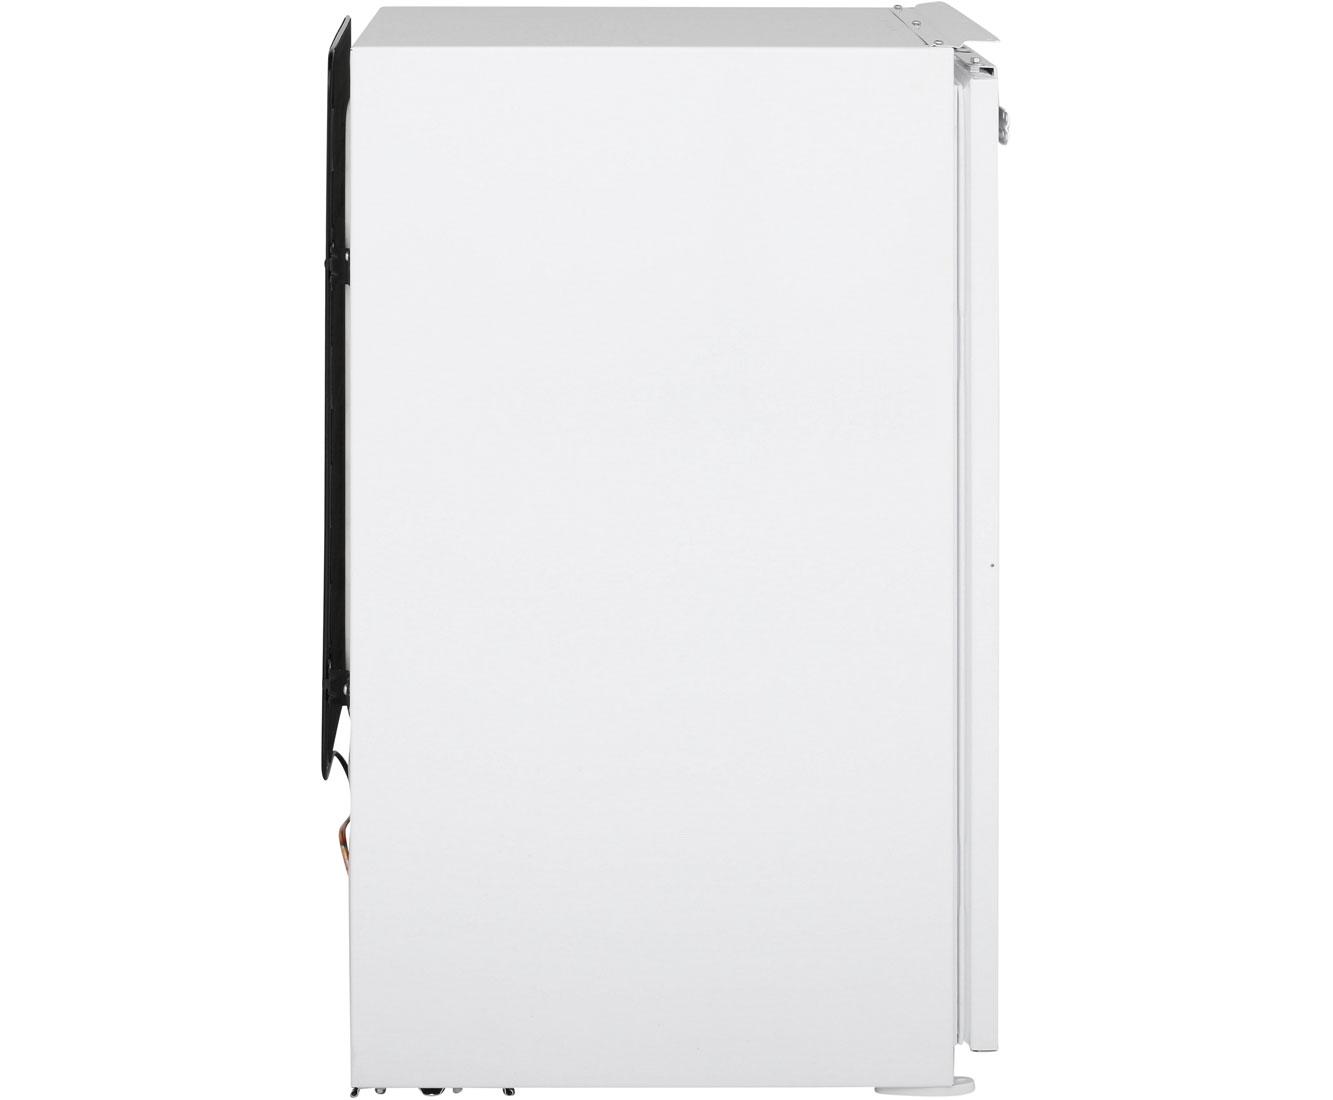 Gorenje Kühlschrank Lüfter : Gorenje ri5092aw einbau kühlschrank 88er nische festtür technik a